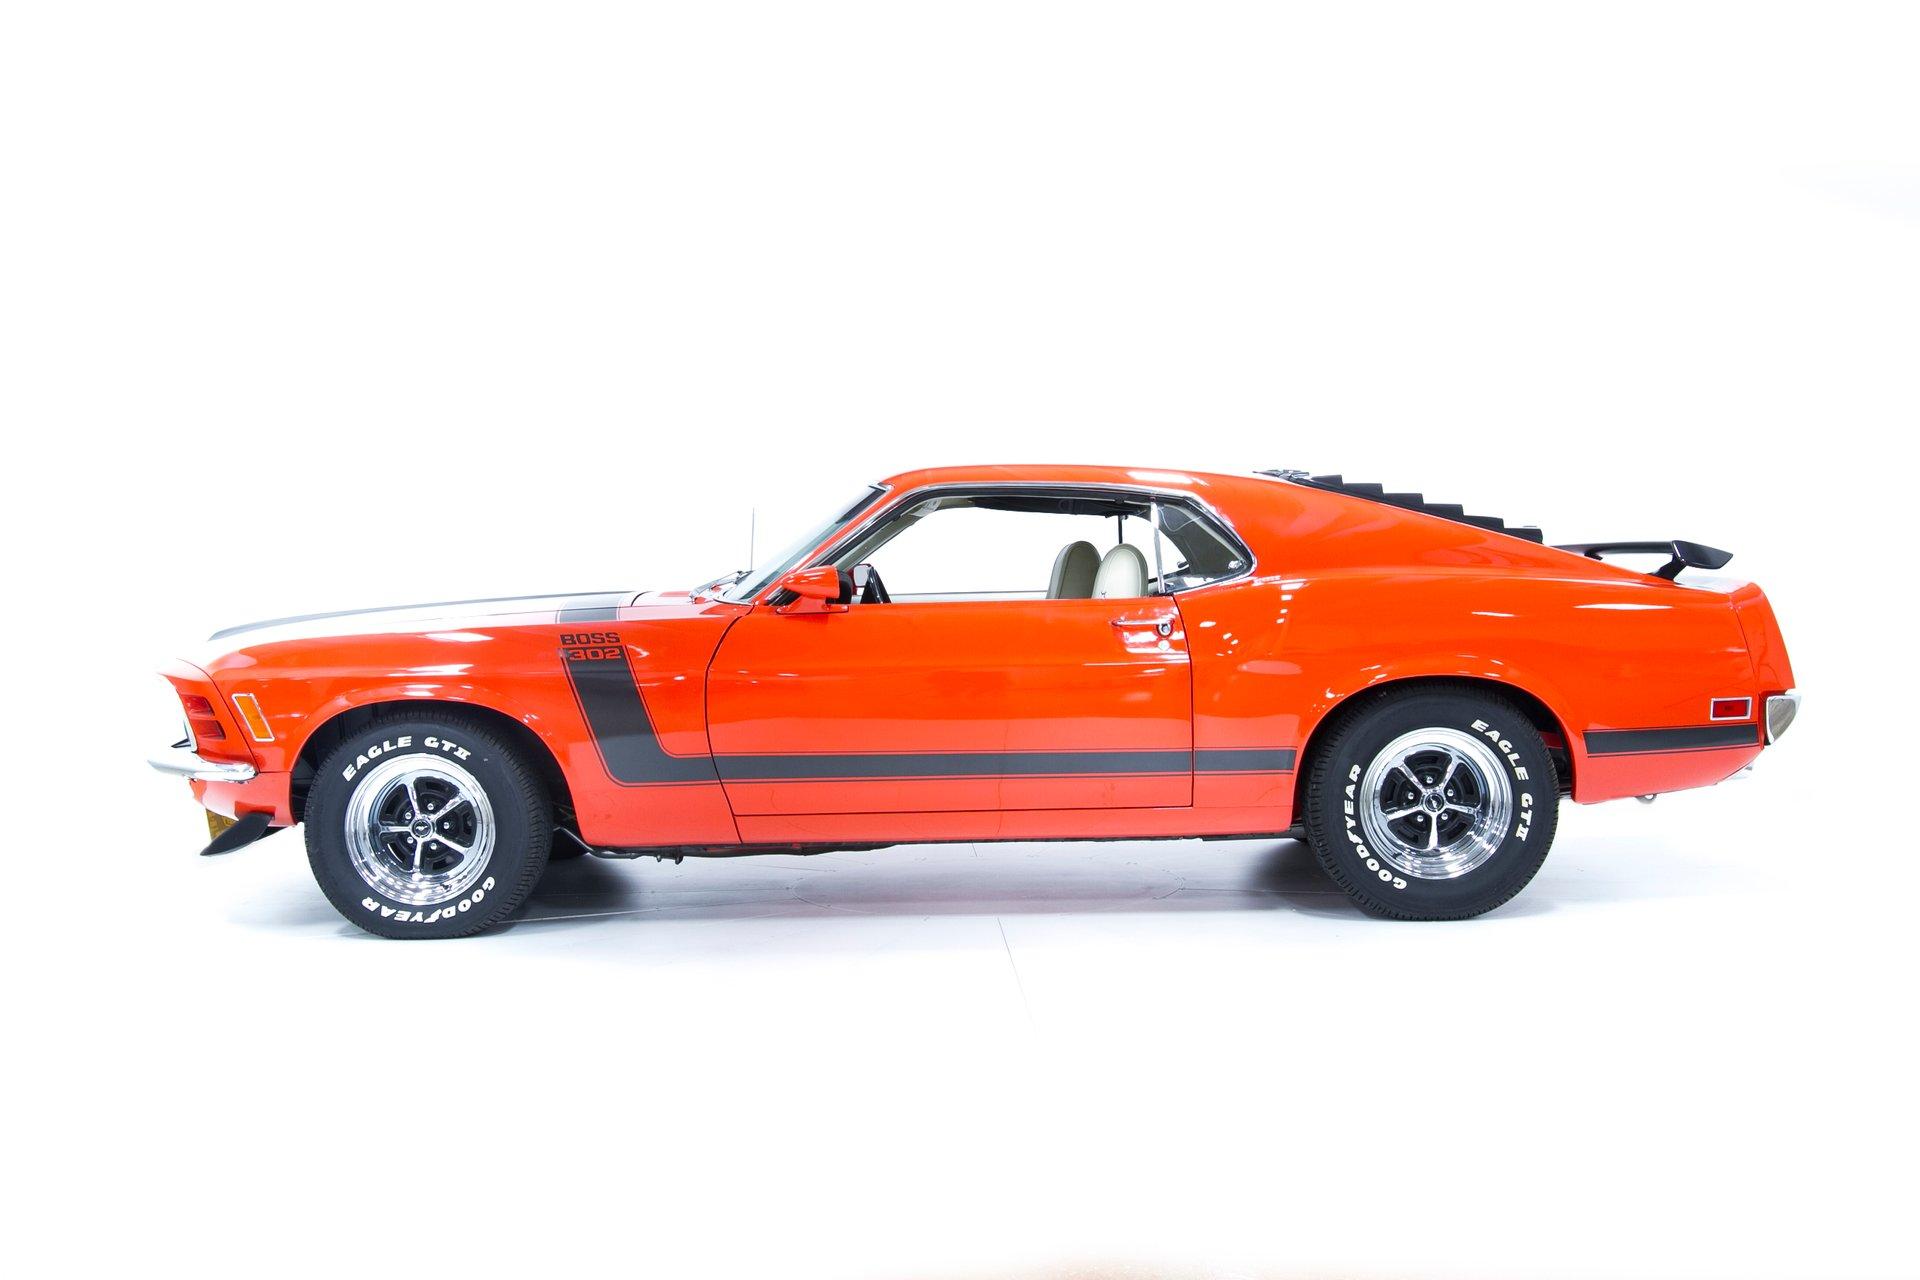 1970 Ford Mustang Boss 302 Motorcar Gallery